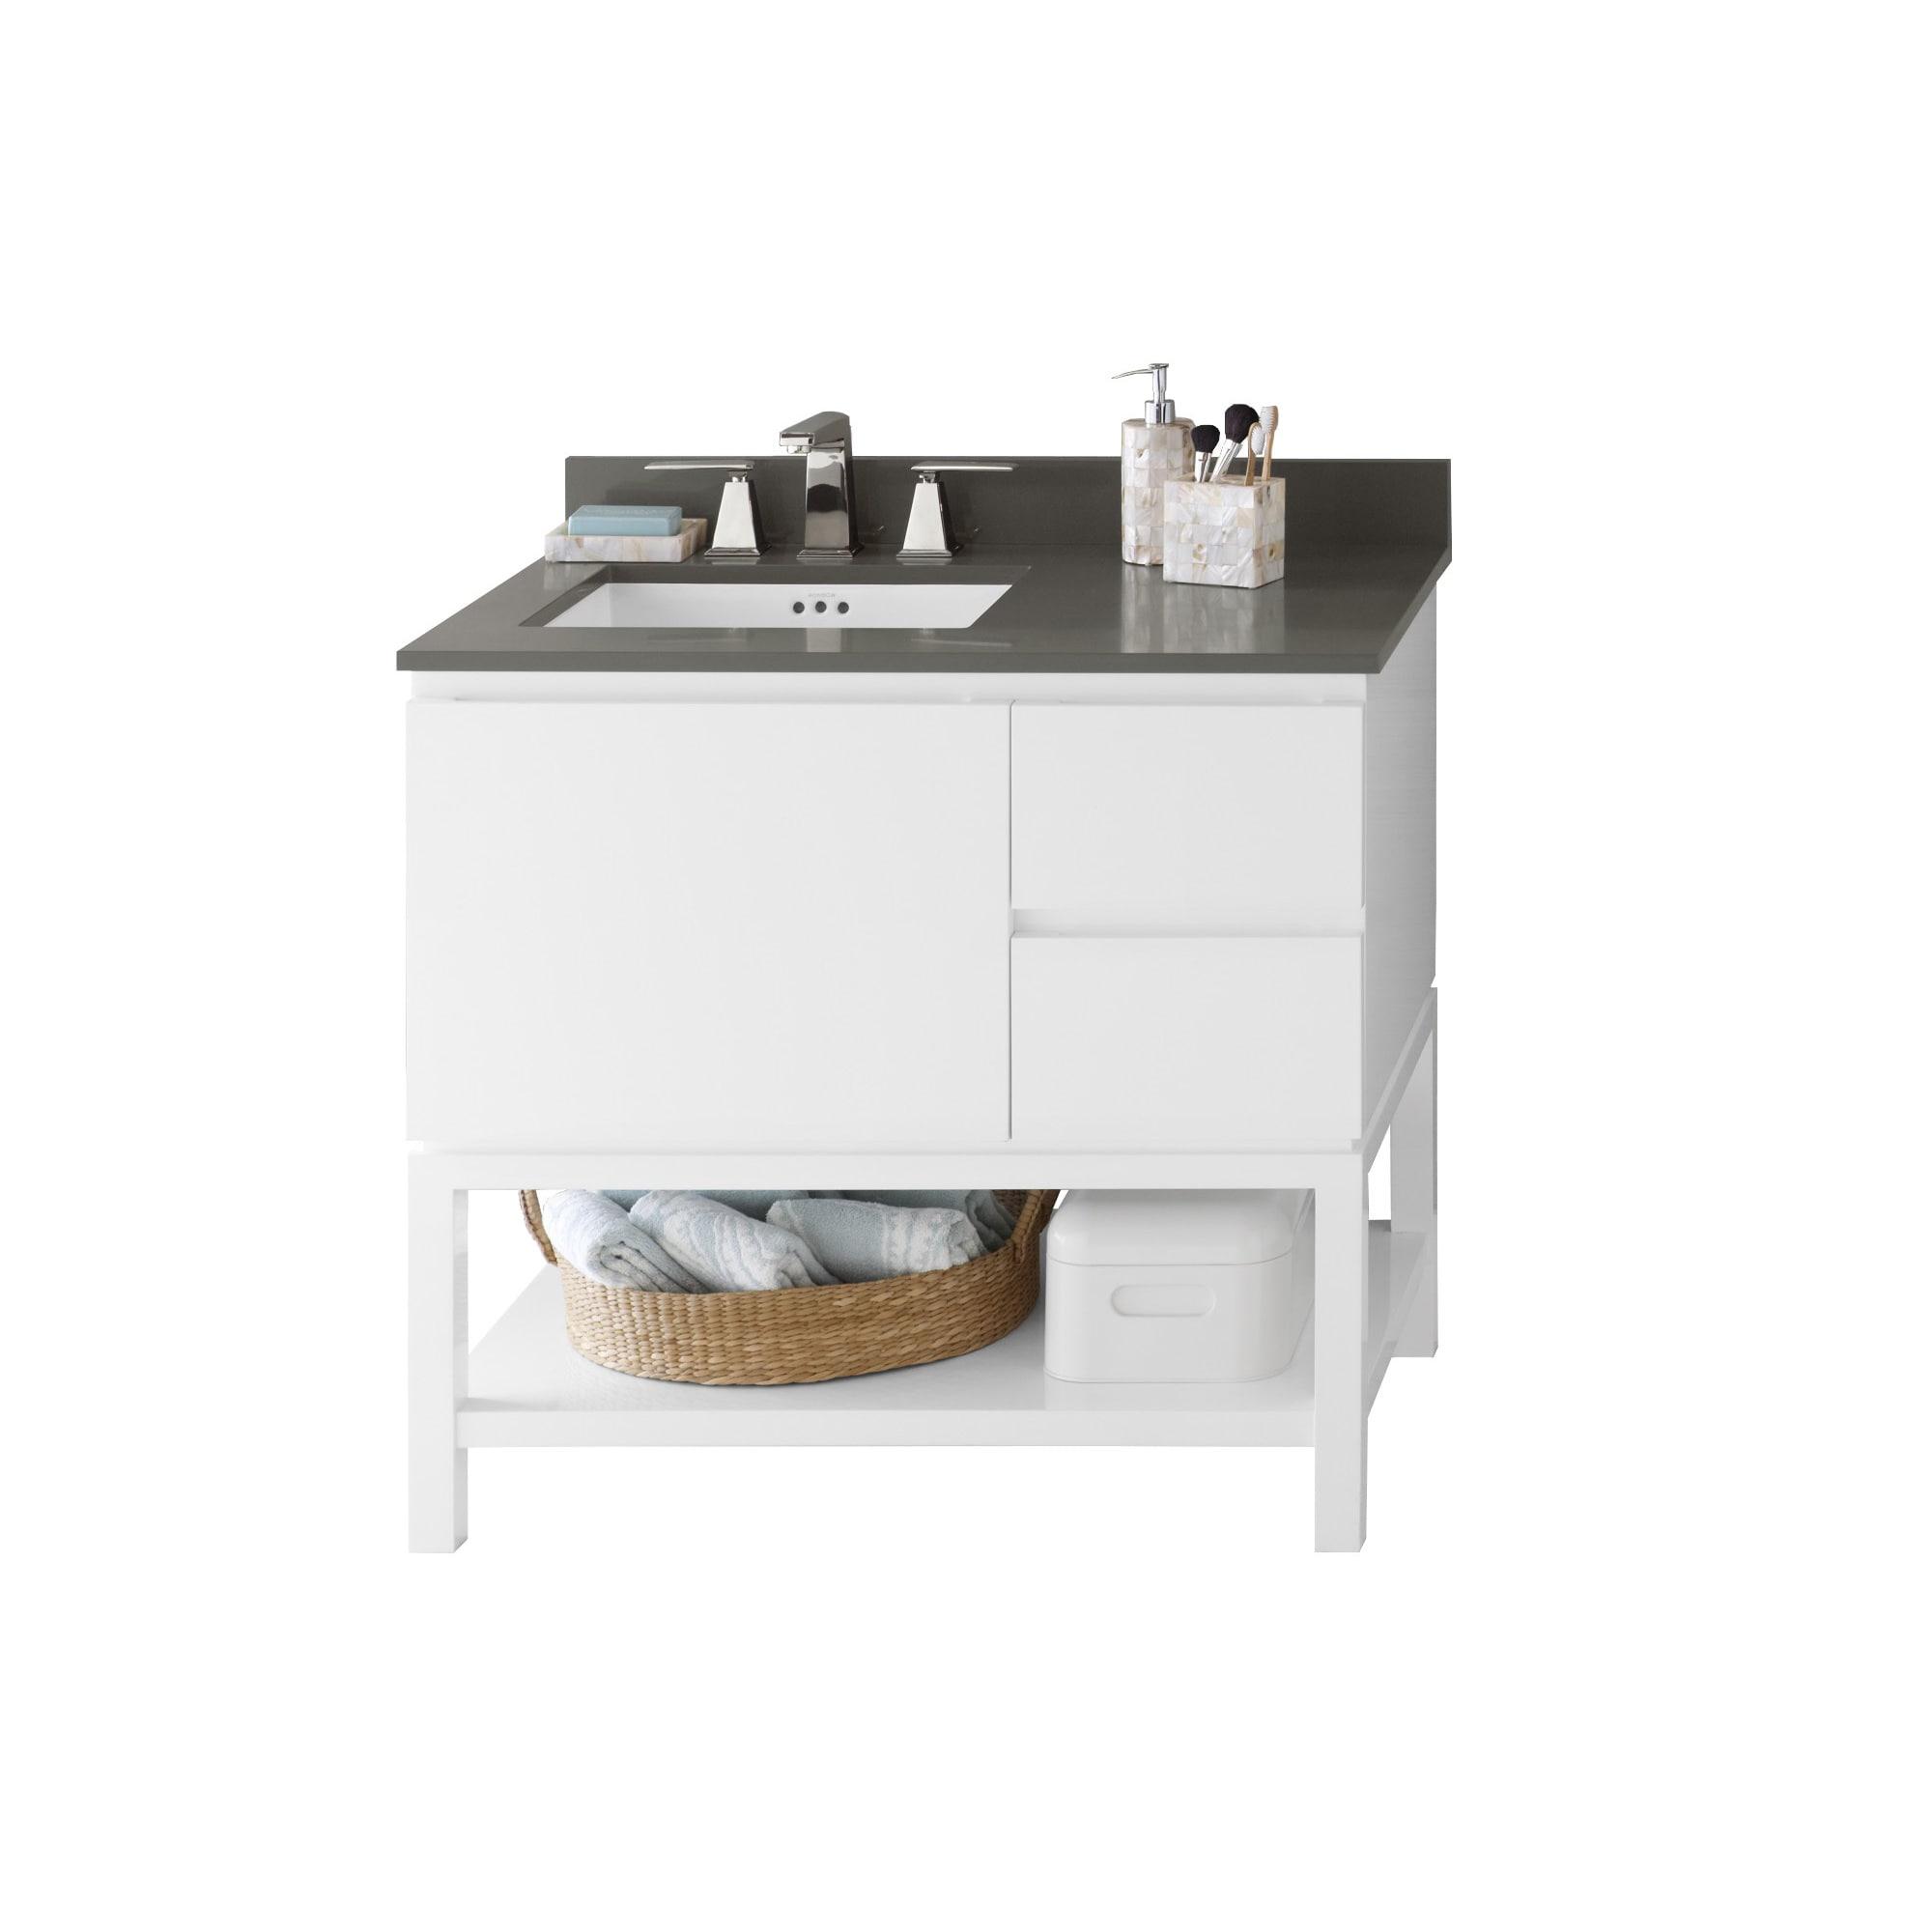 Ronbow Chloe 36 Inch Bathroom Vanity Set In Glossy White Quartz Countertop And Backsplash With Ceramic Bathroom Sink In White Overstock 13983703